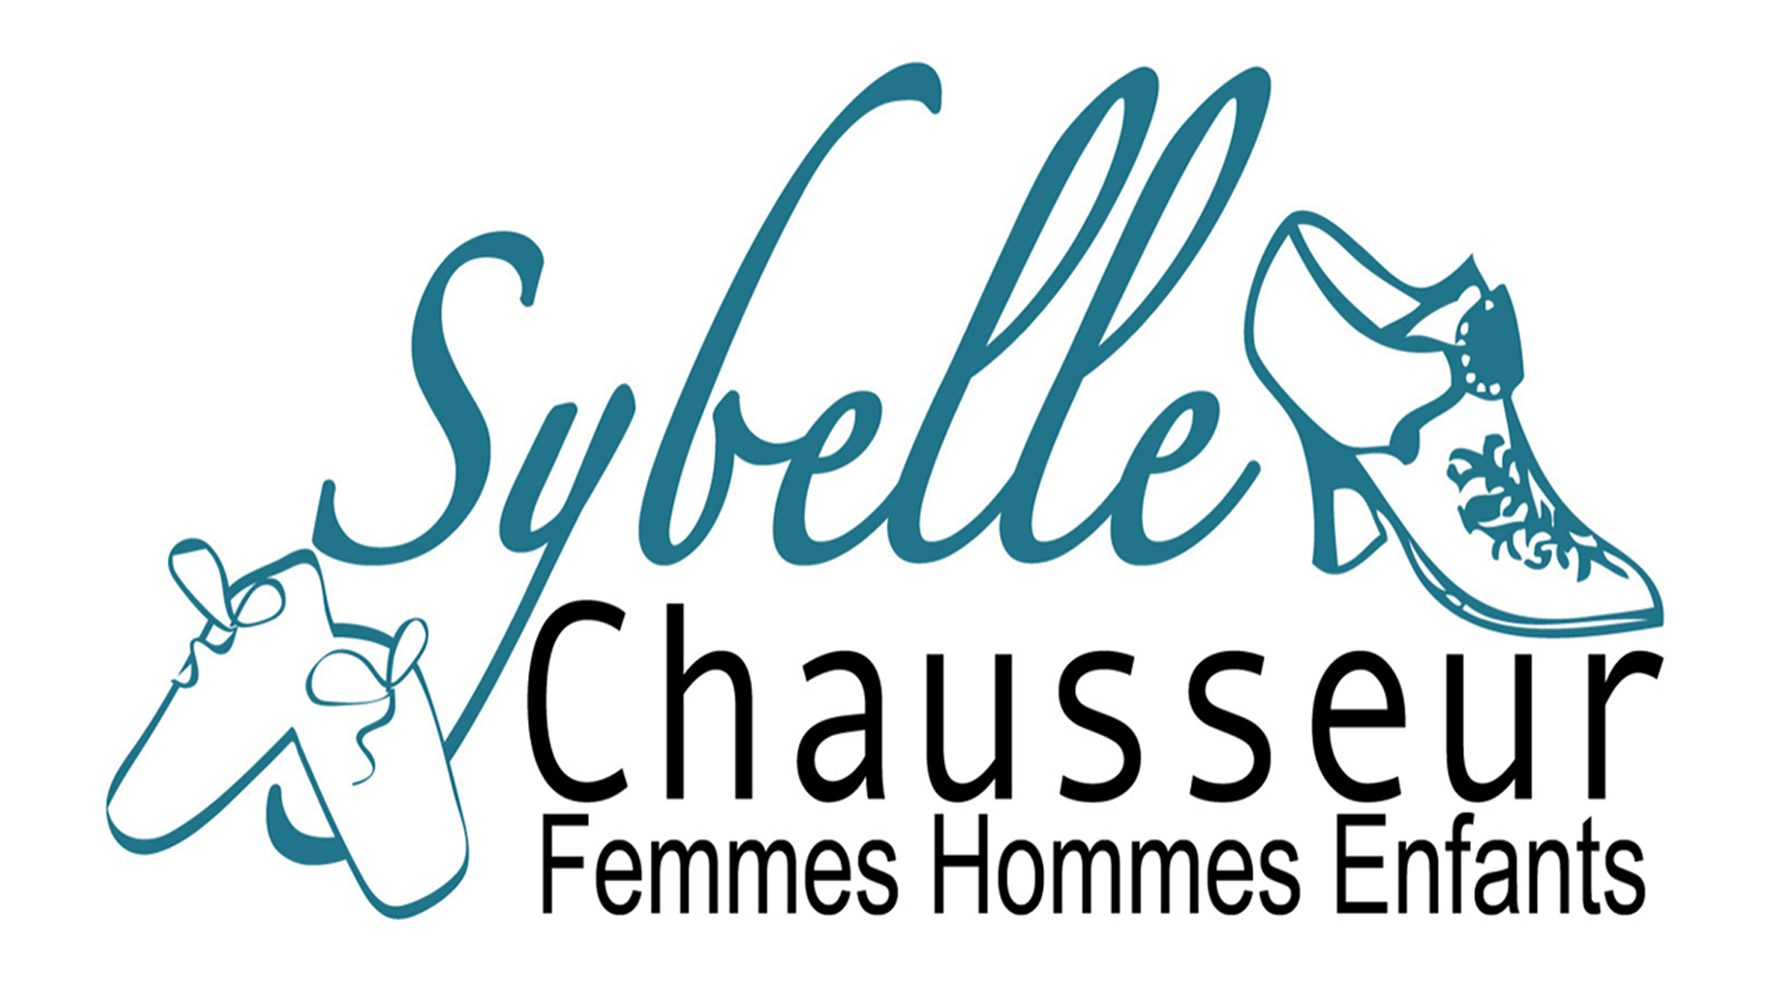 Sybelle Chausseur